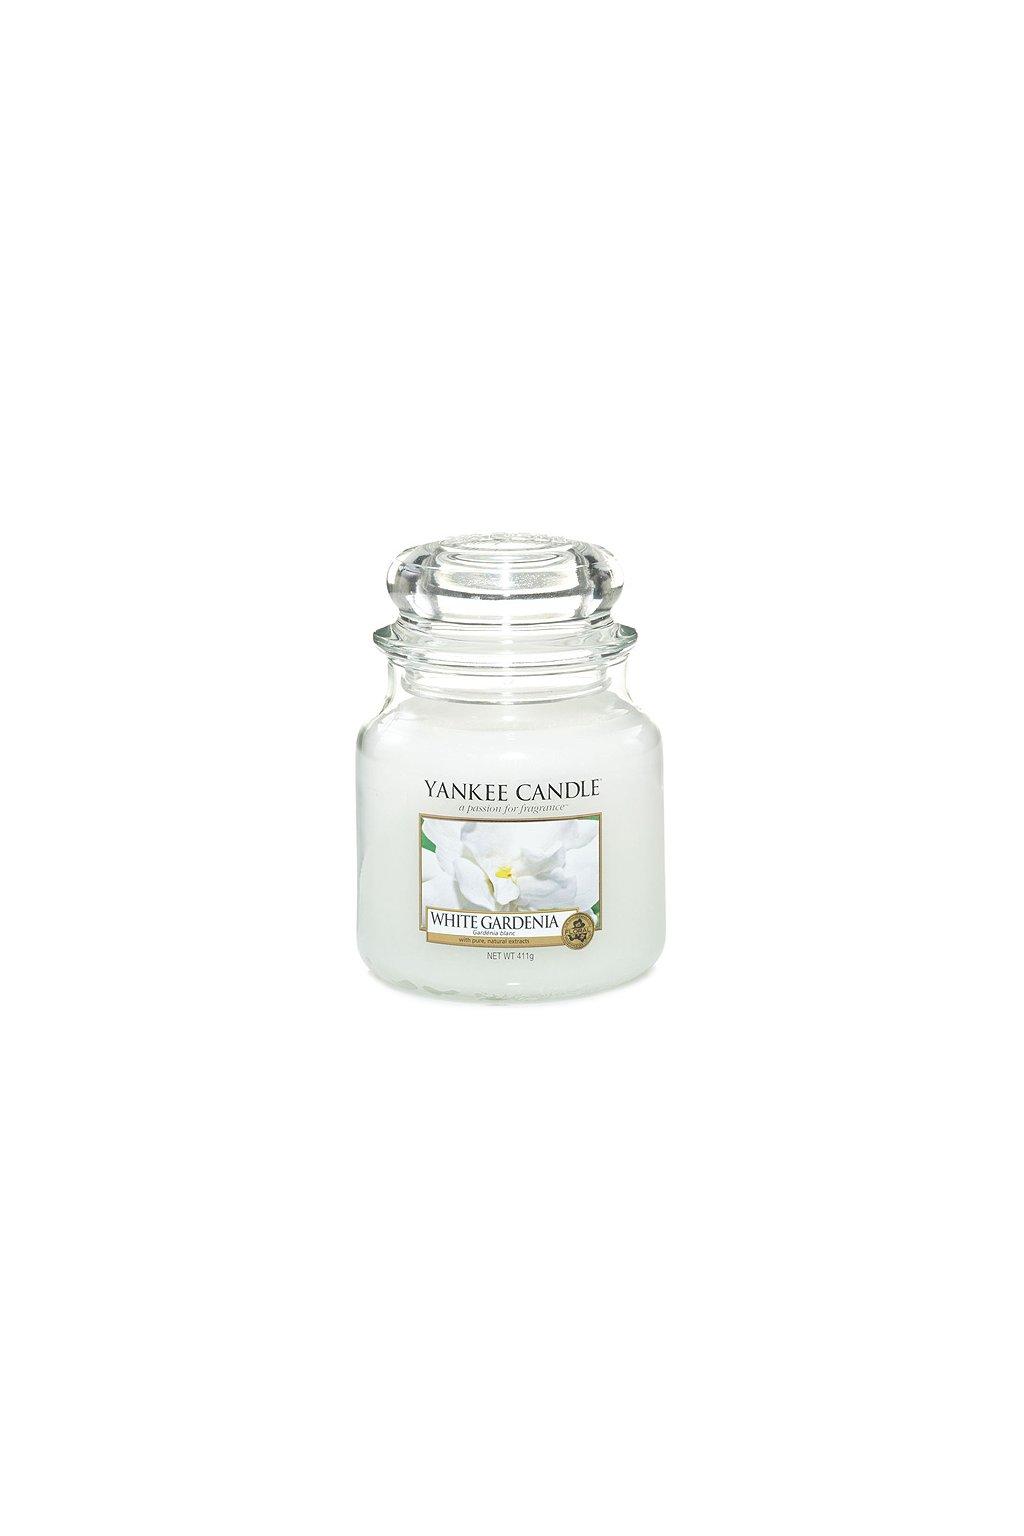 Yankee Candle White Gardenia 411g